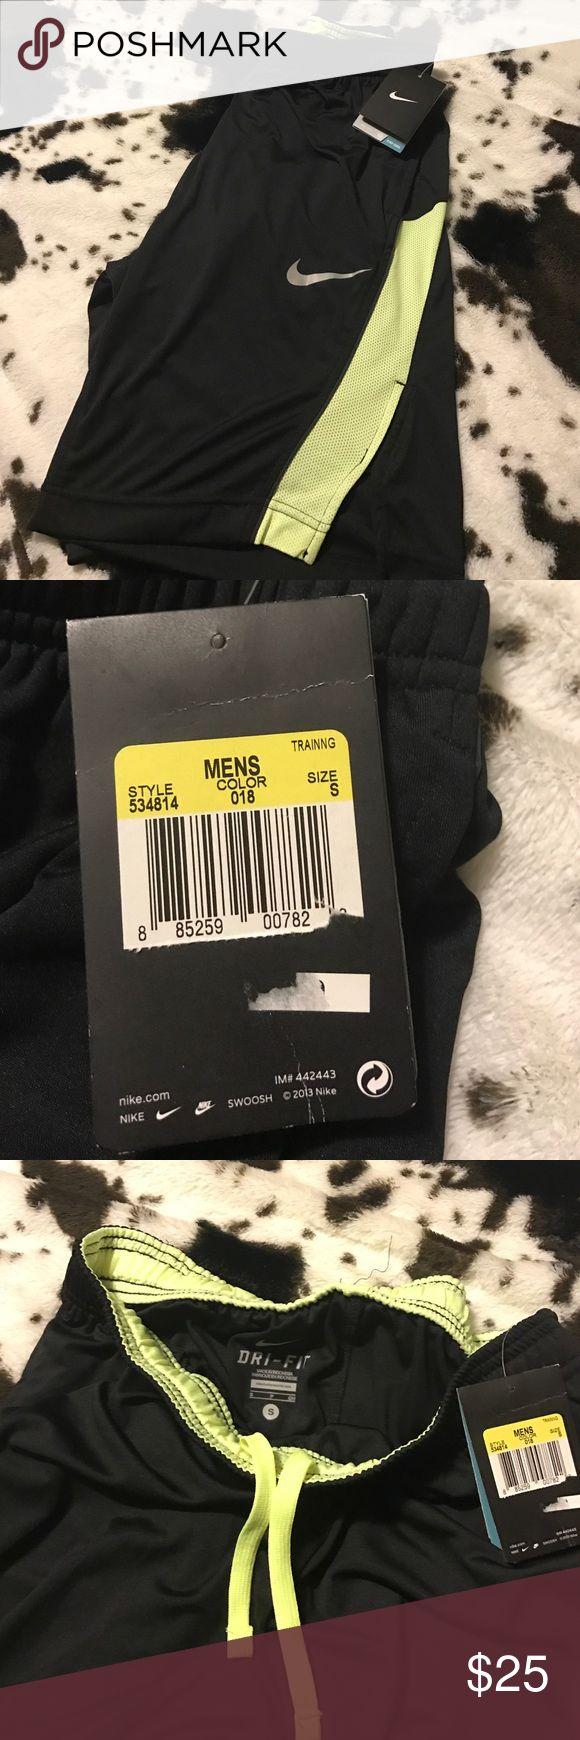 NWT Nike shorts, Dri Fit size Small NWT Nike Men's shorts, Dri Fit size Small never worn Nike Shorts Athletic